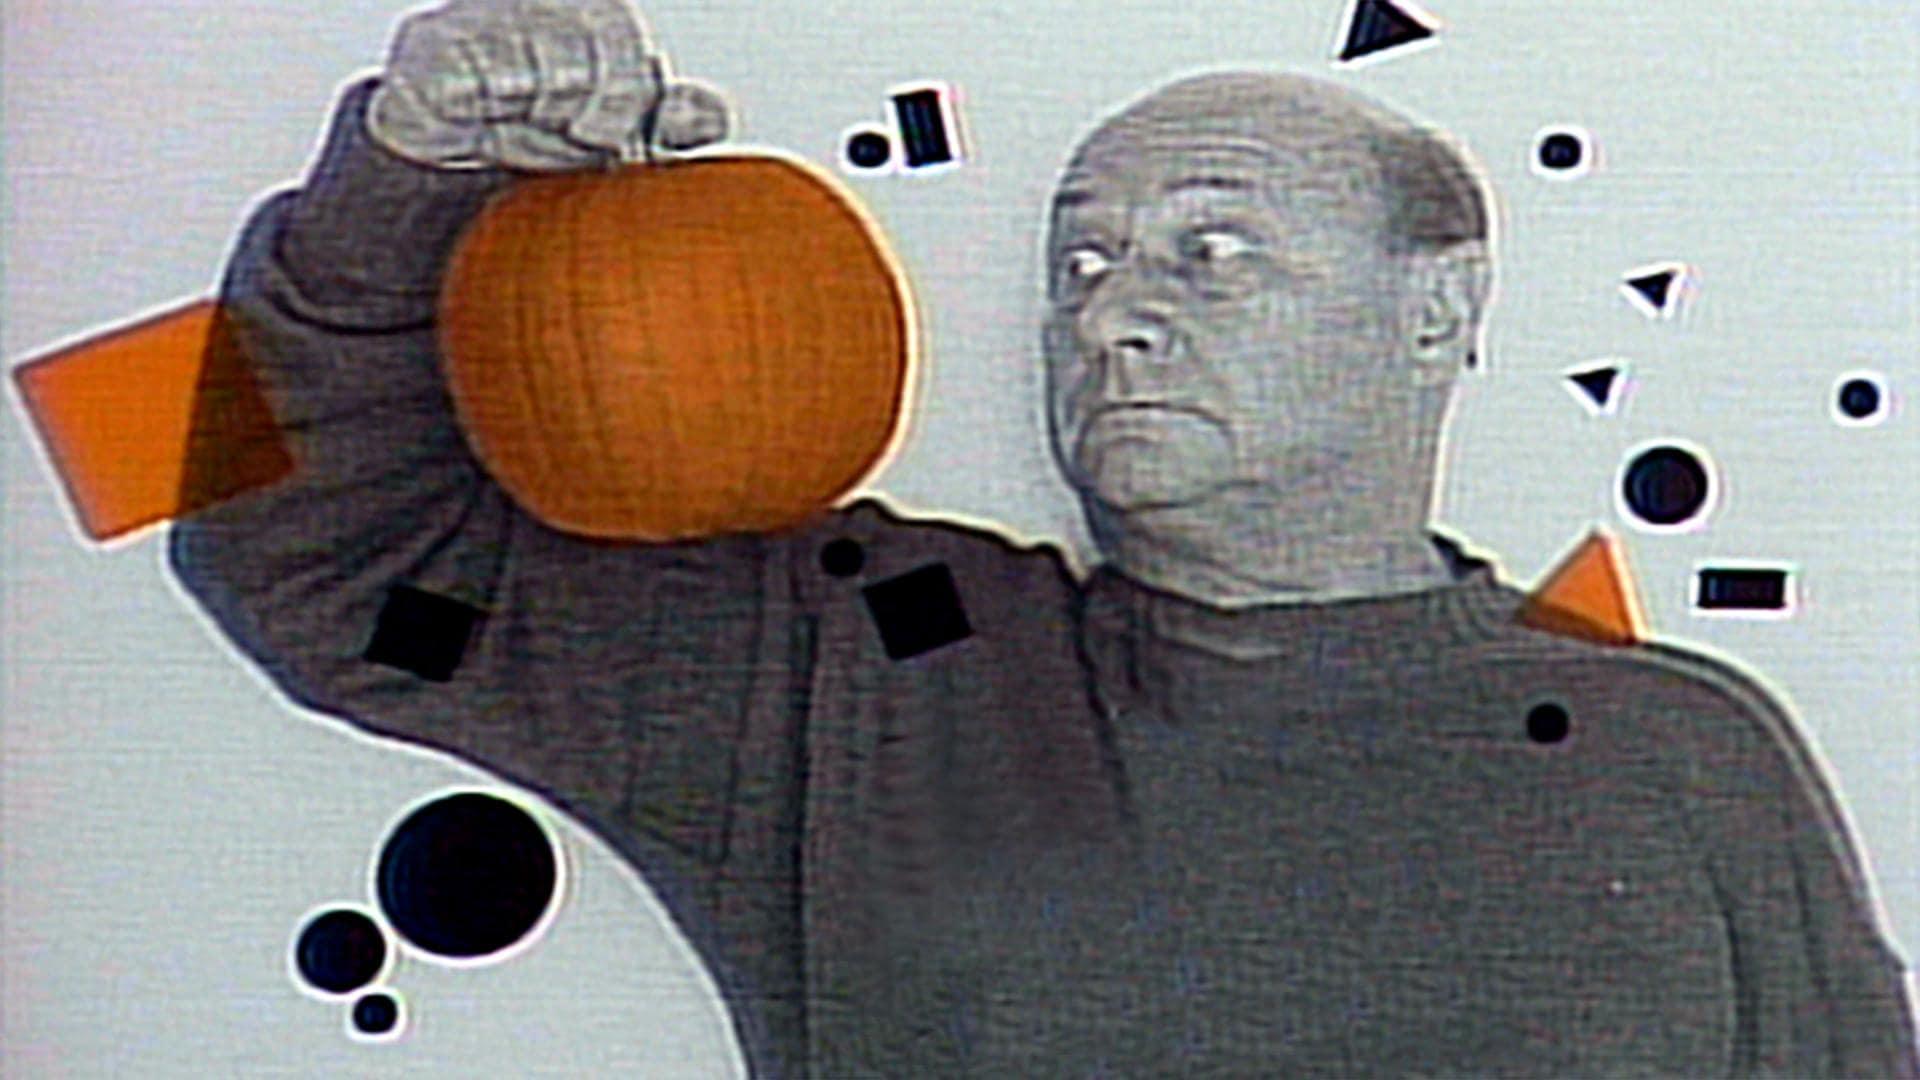 Donald Pleasance: October 31, 1981